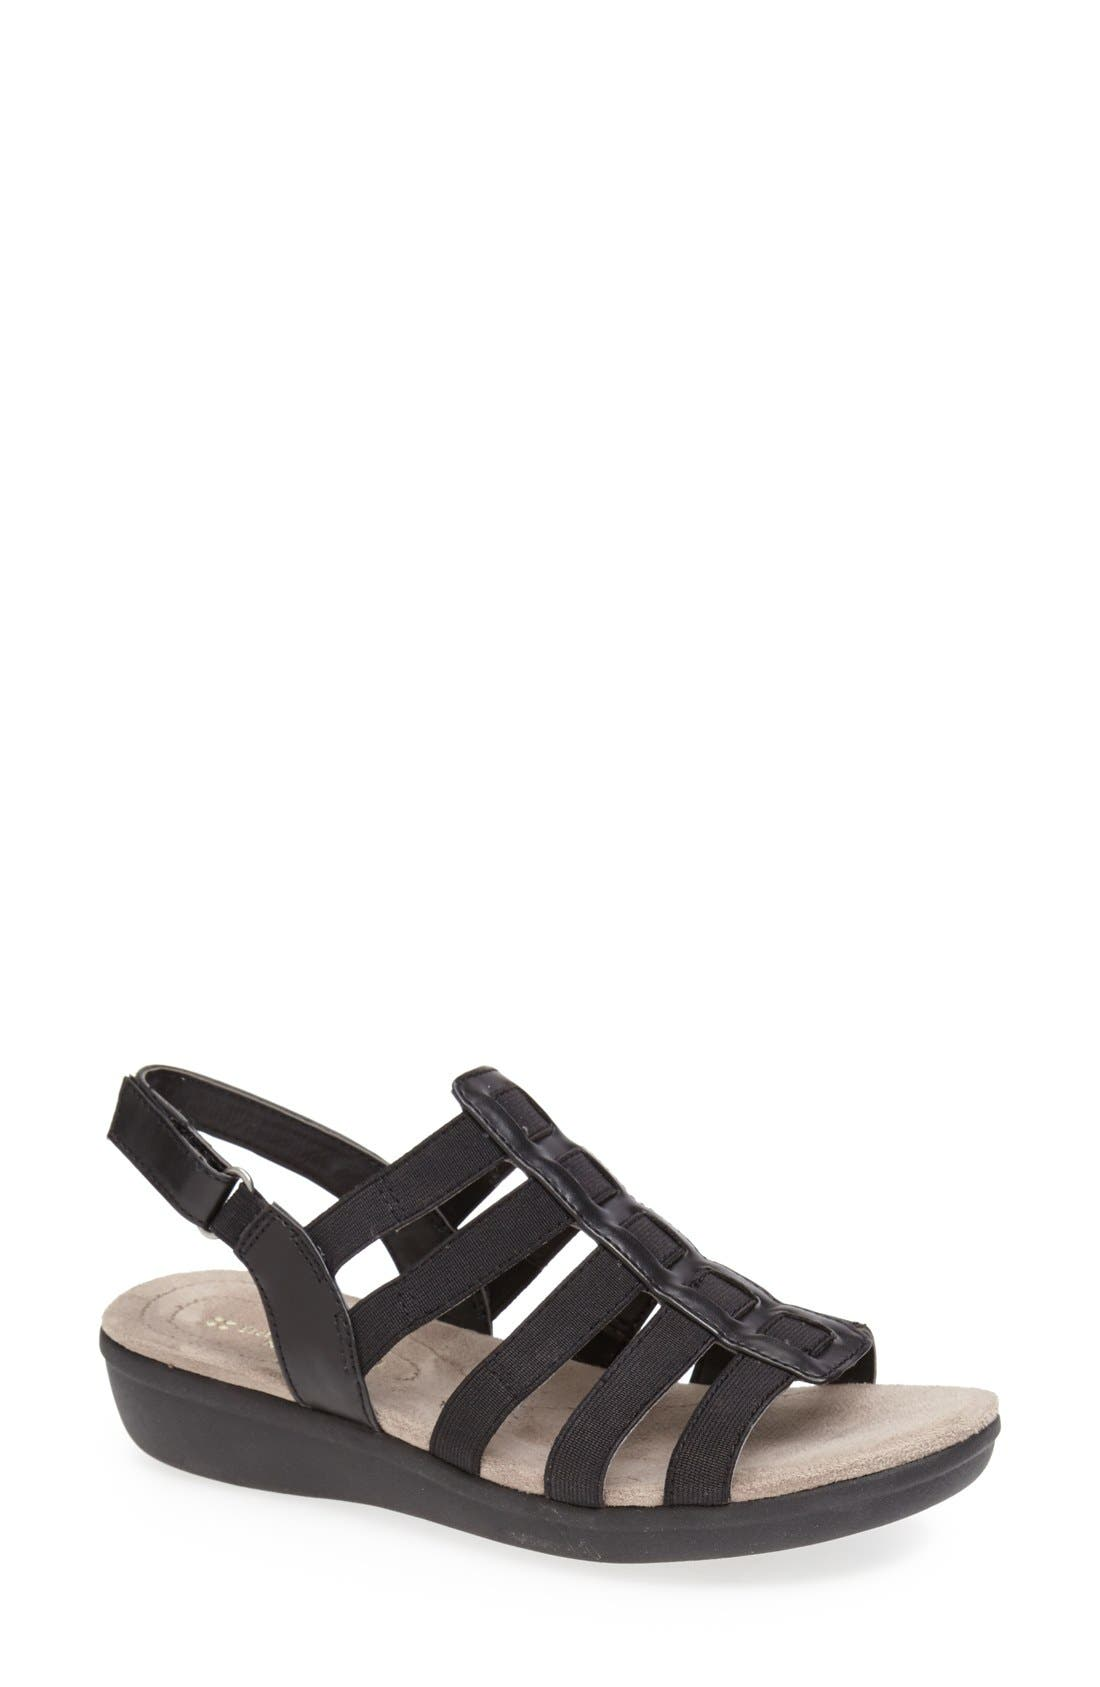 Alternate Image 1 Selected - Naturalizer 'Wyonna' Leather Sandal (Women)